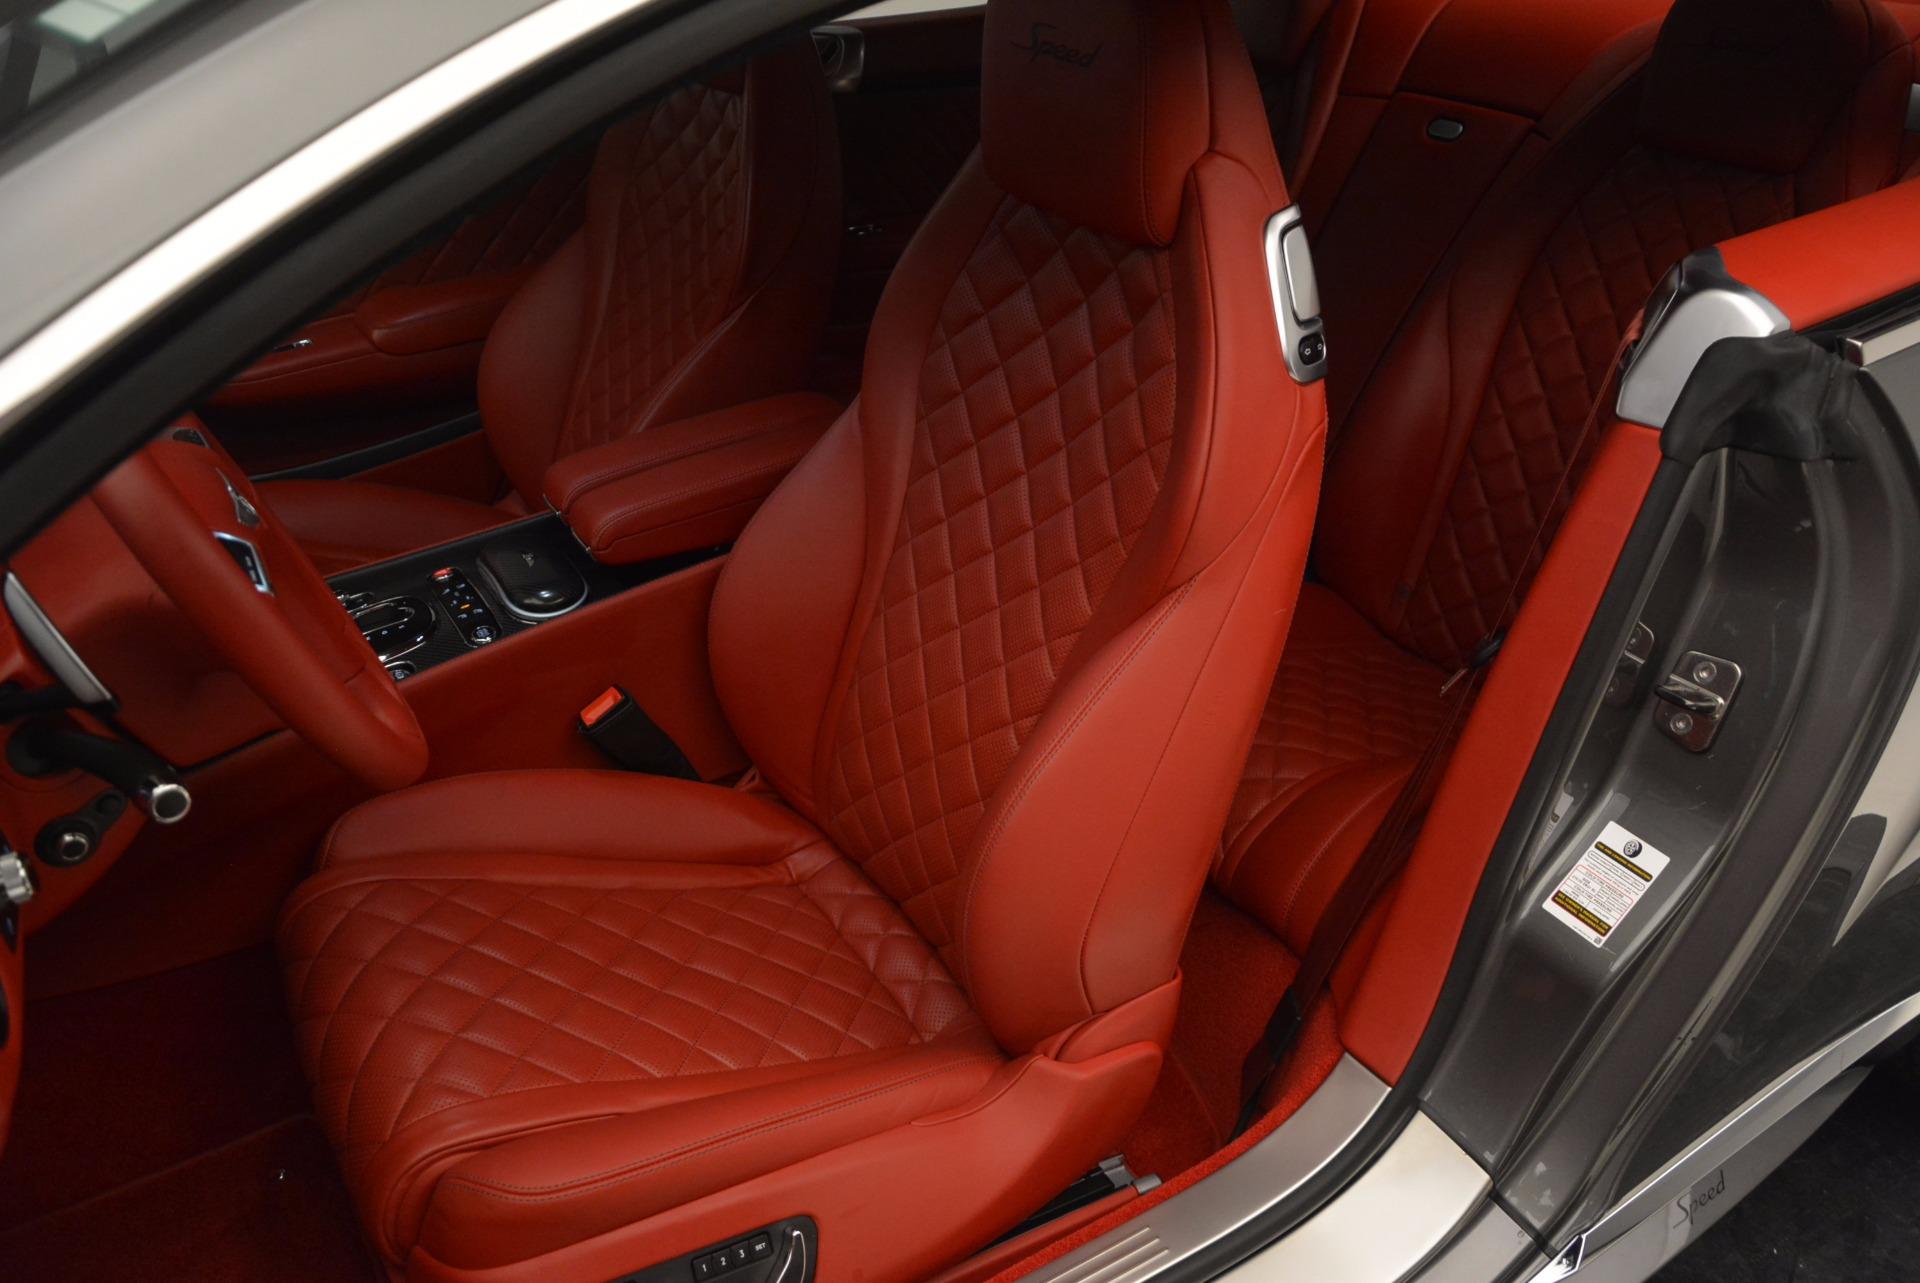 Used 2016 Bentley Continental GT Speed For Sale In Westport, CT 910_p26